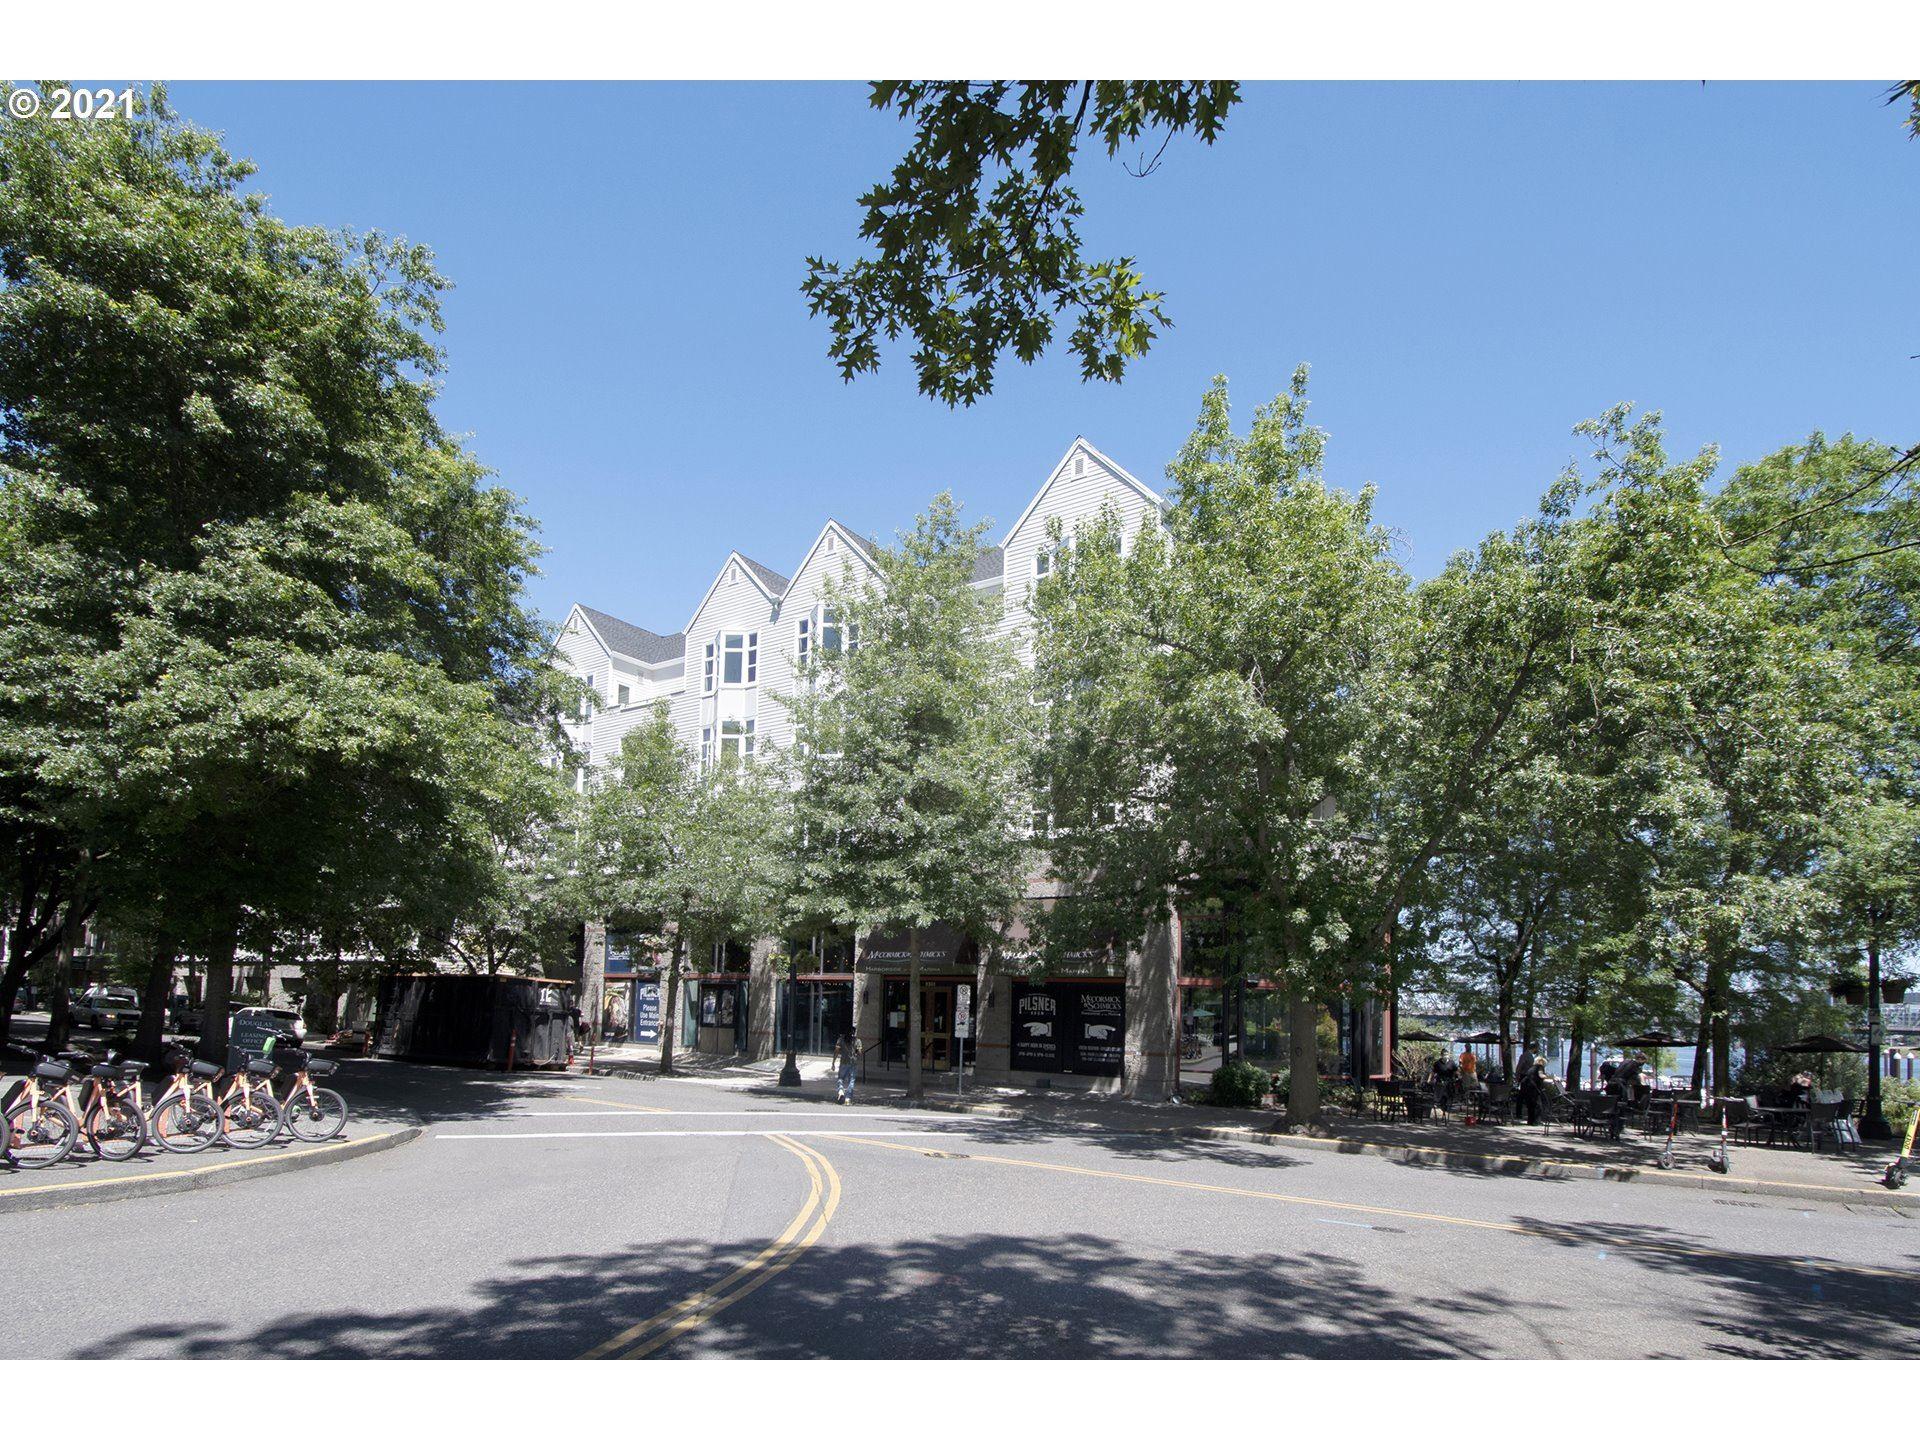 305 S MONTGOMERY ST #302, Portland, OR 97201 - MLS#: 21599108